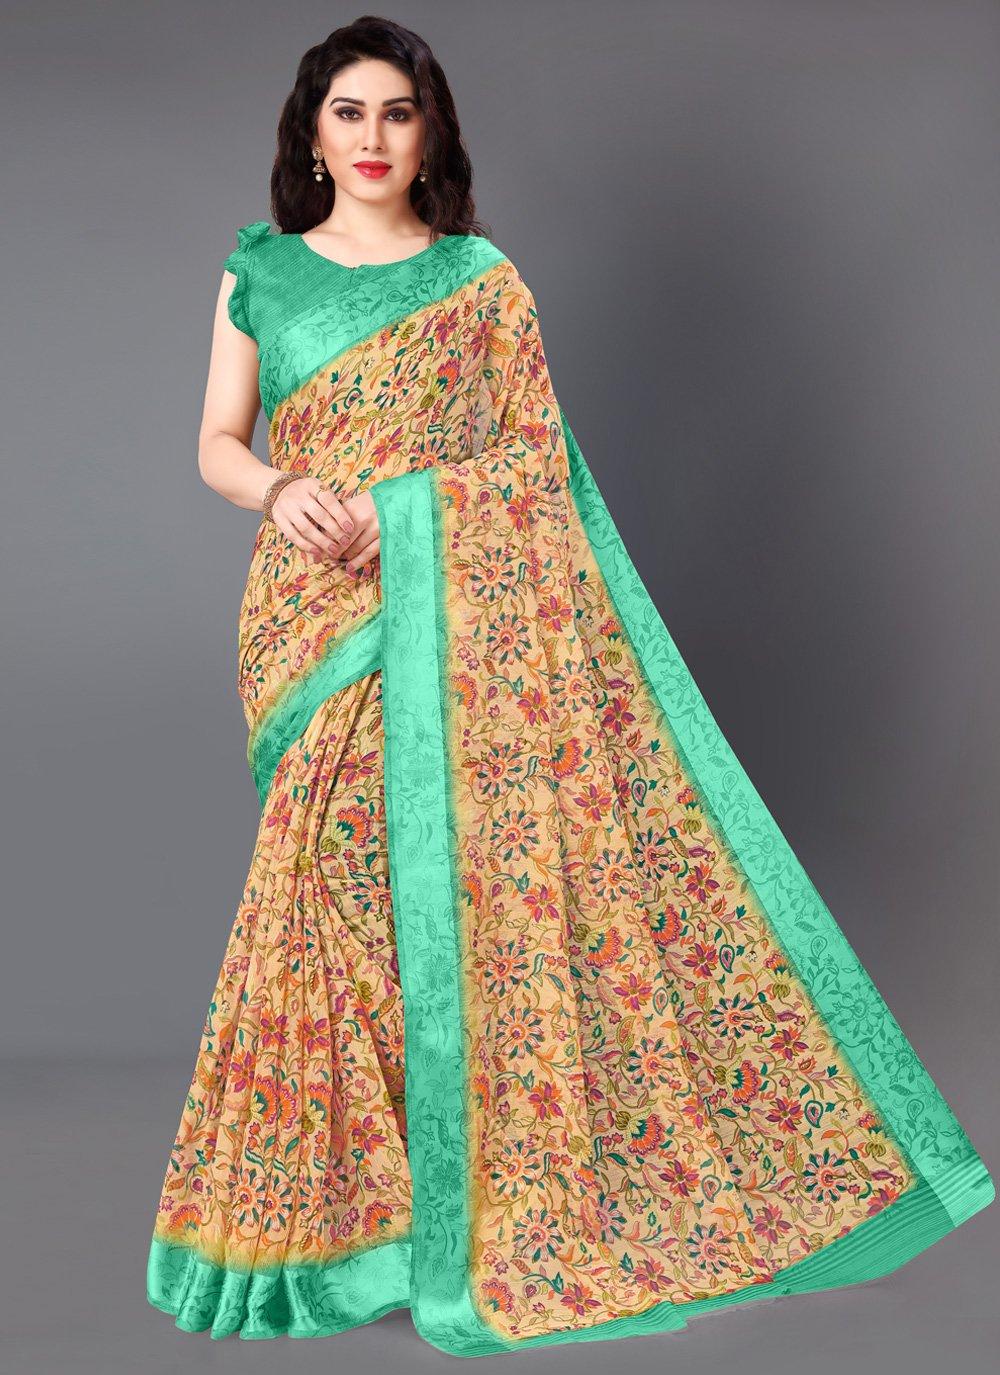 Cotton Floral Print Multi Colour Casual Saree